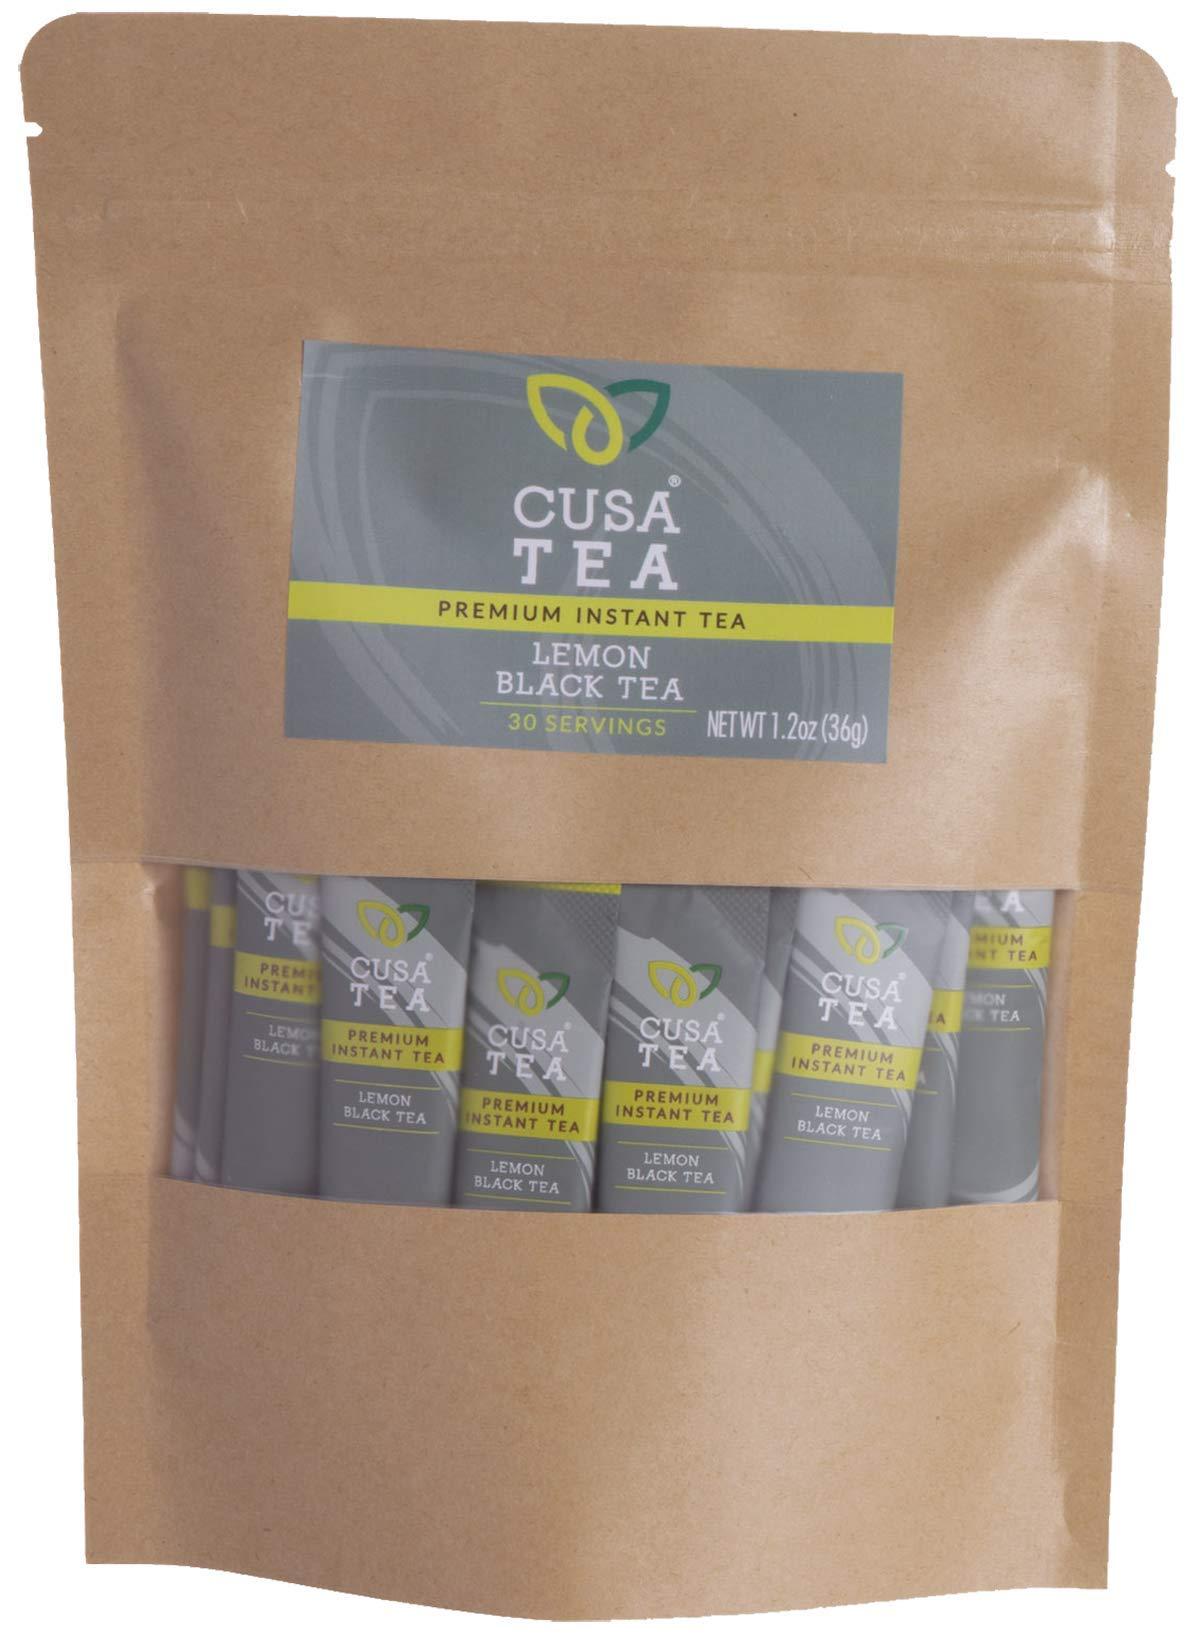 Cusa Tea: Premium Instant Tea - Single-Serve Packets - 100% Organic - Real Fruit and Spices - No Artificial Flavors - Make Hot & Cold Tea in Seconds - Lemon Black Tea 30 Servings